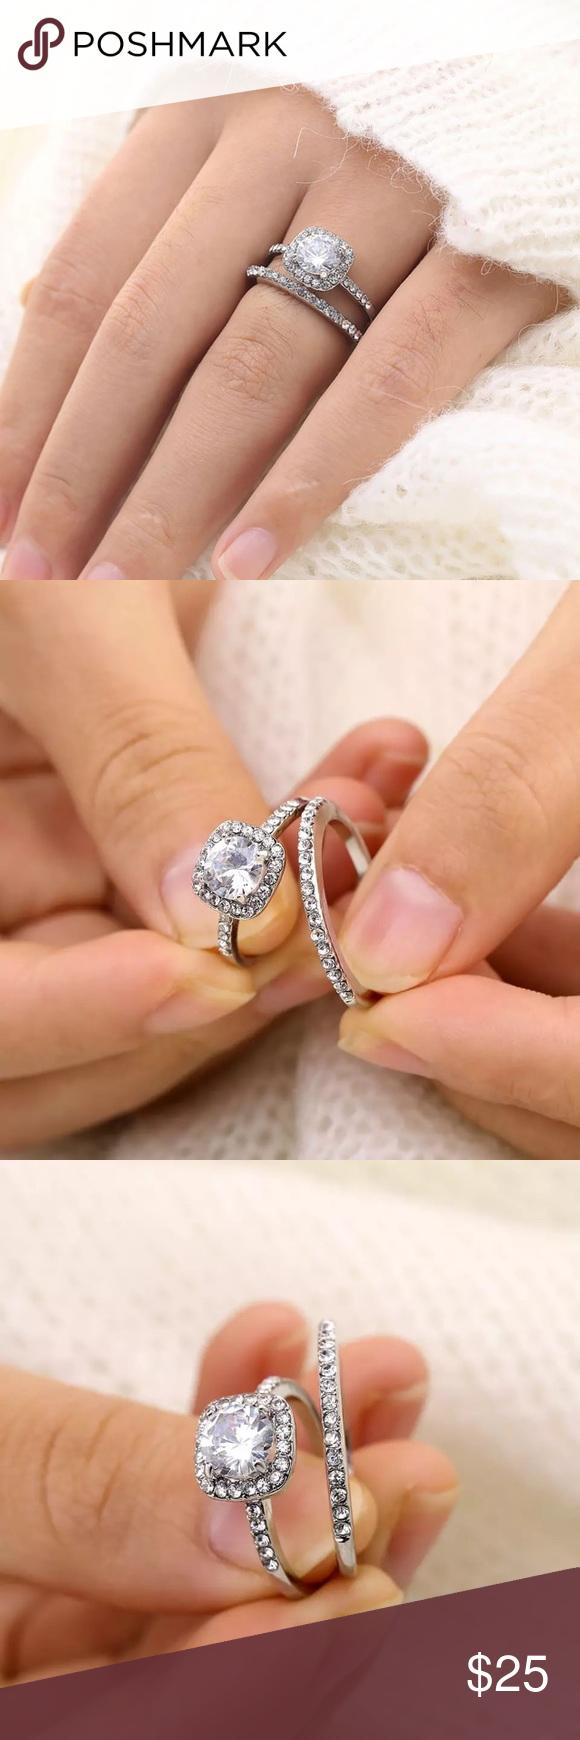 Beautiful Crystal Engagement Ring Set Crystal engagement